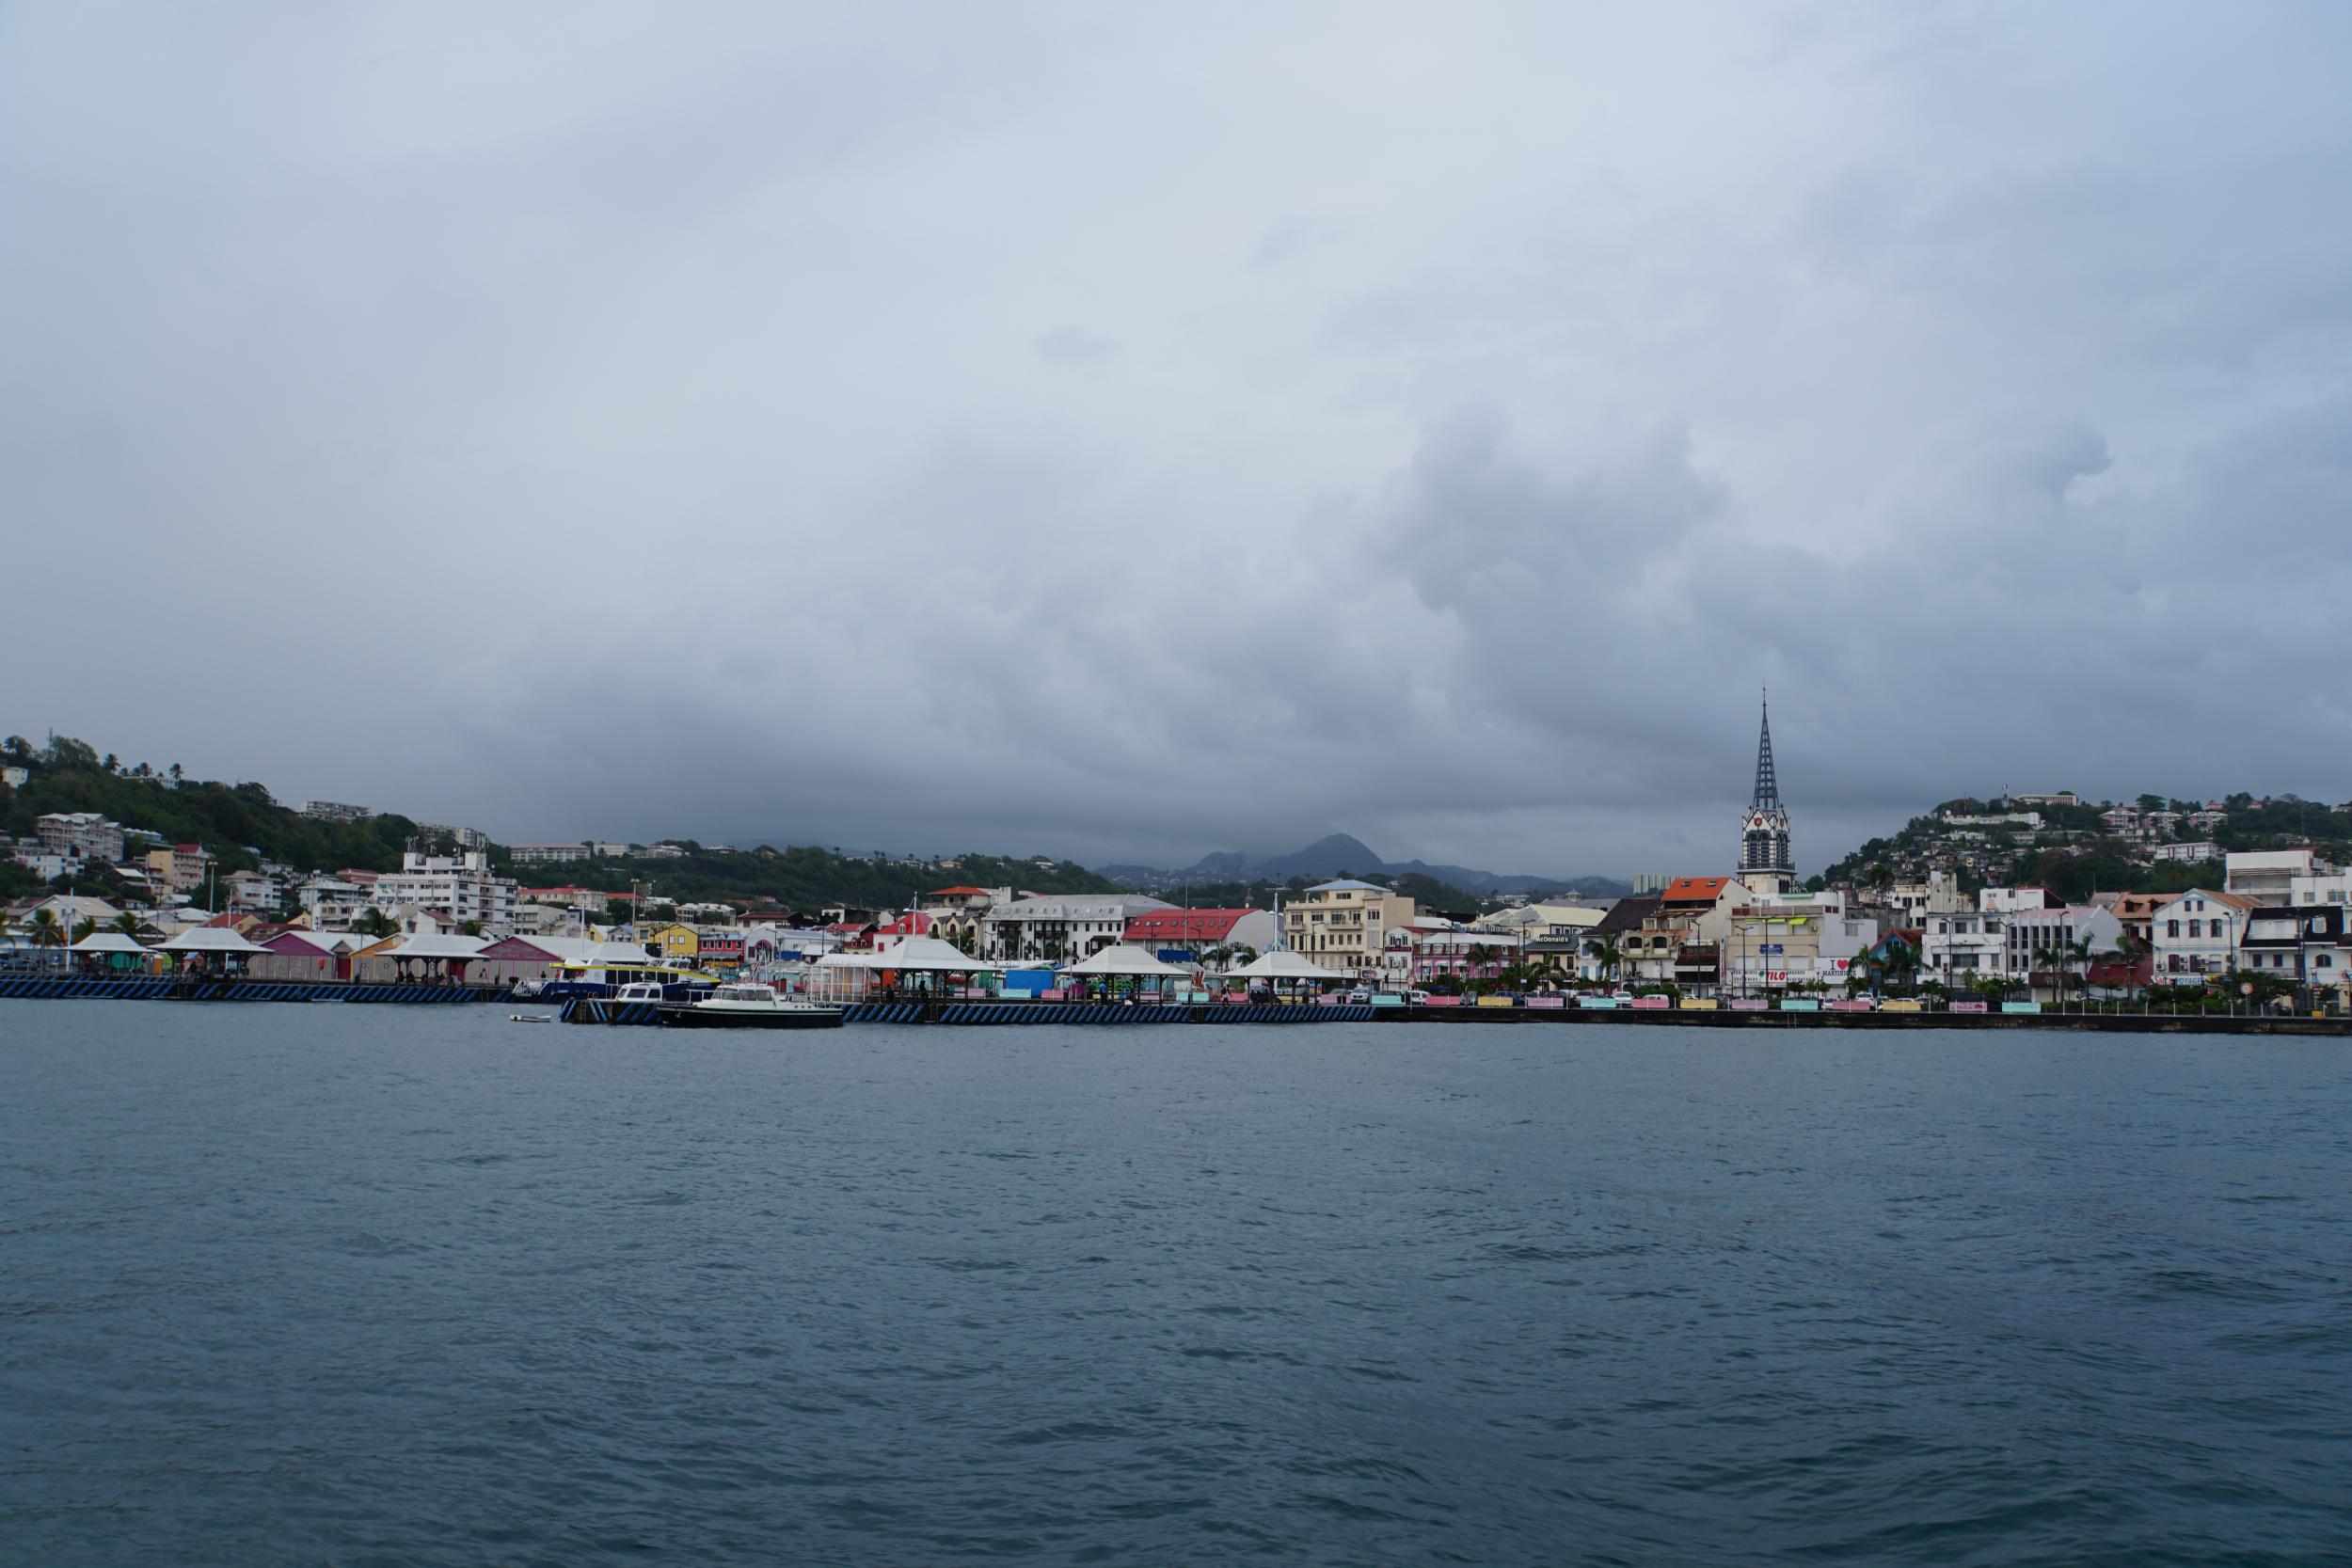 21. Port-de-France, Martinique